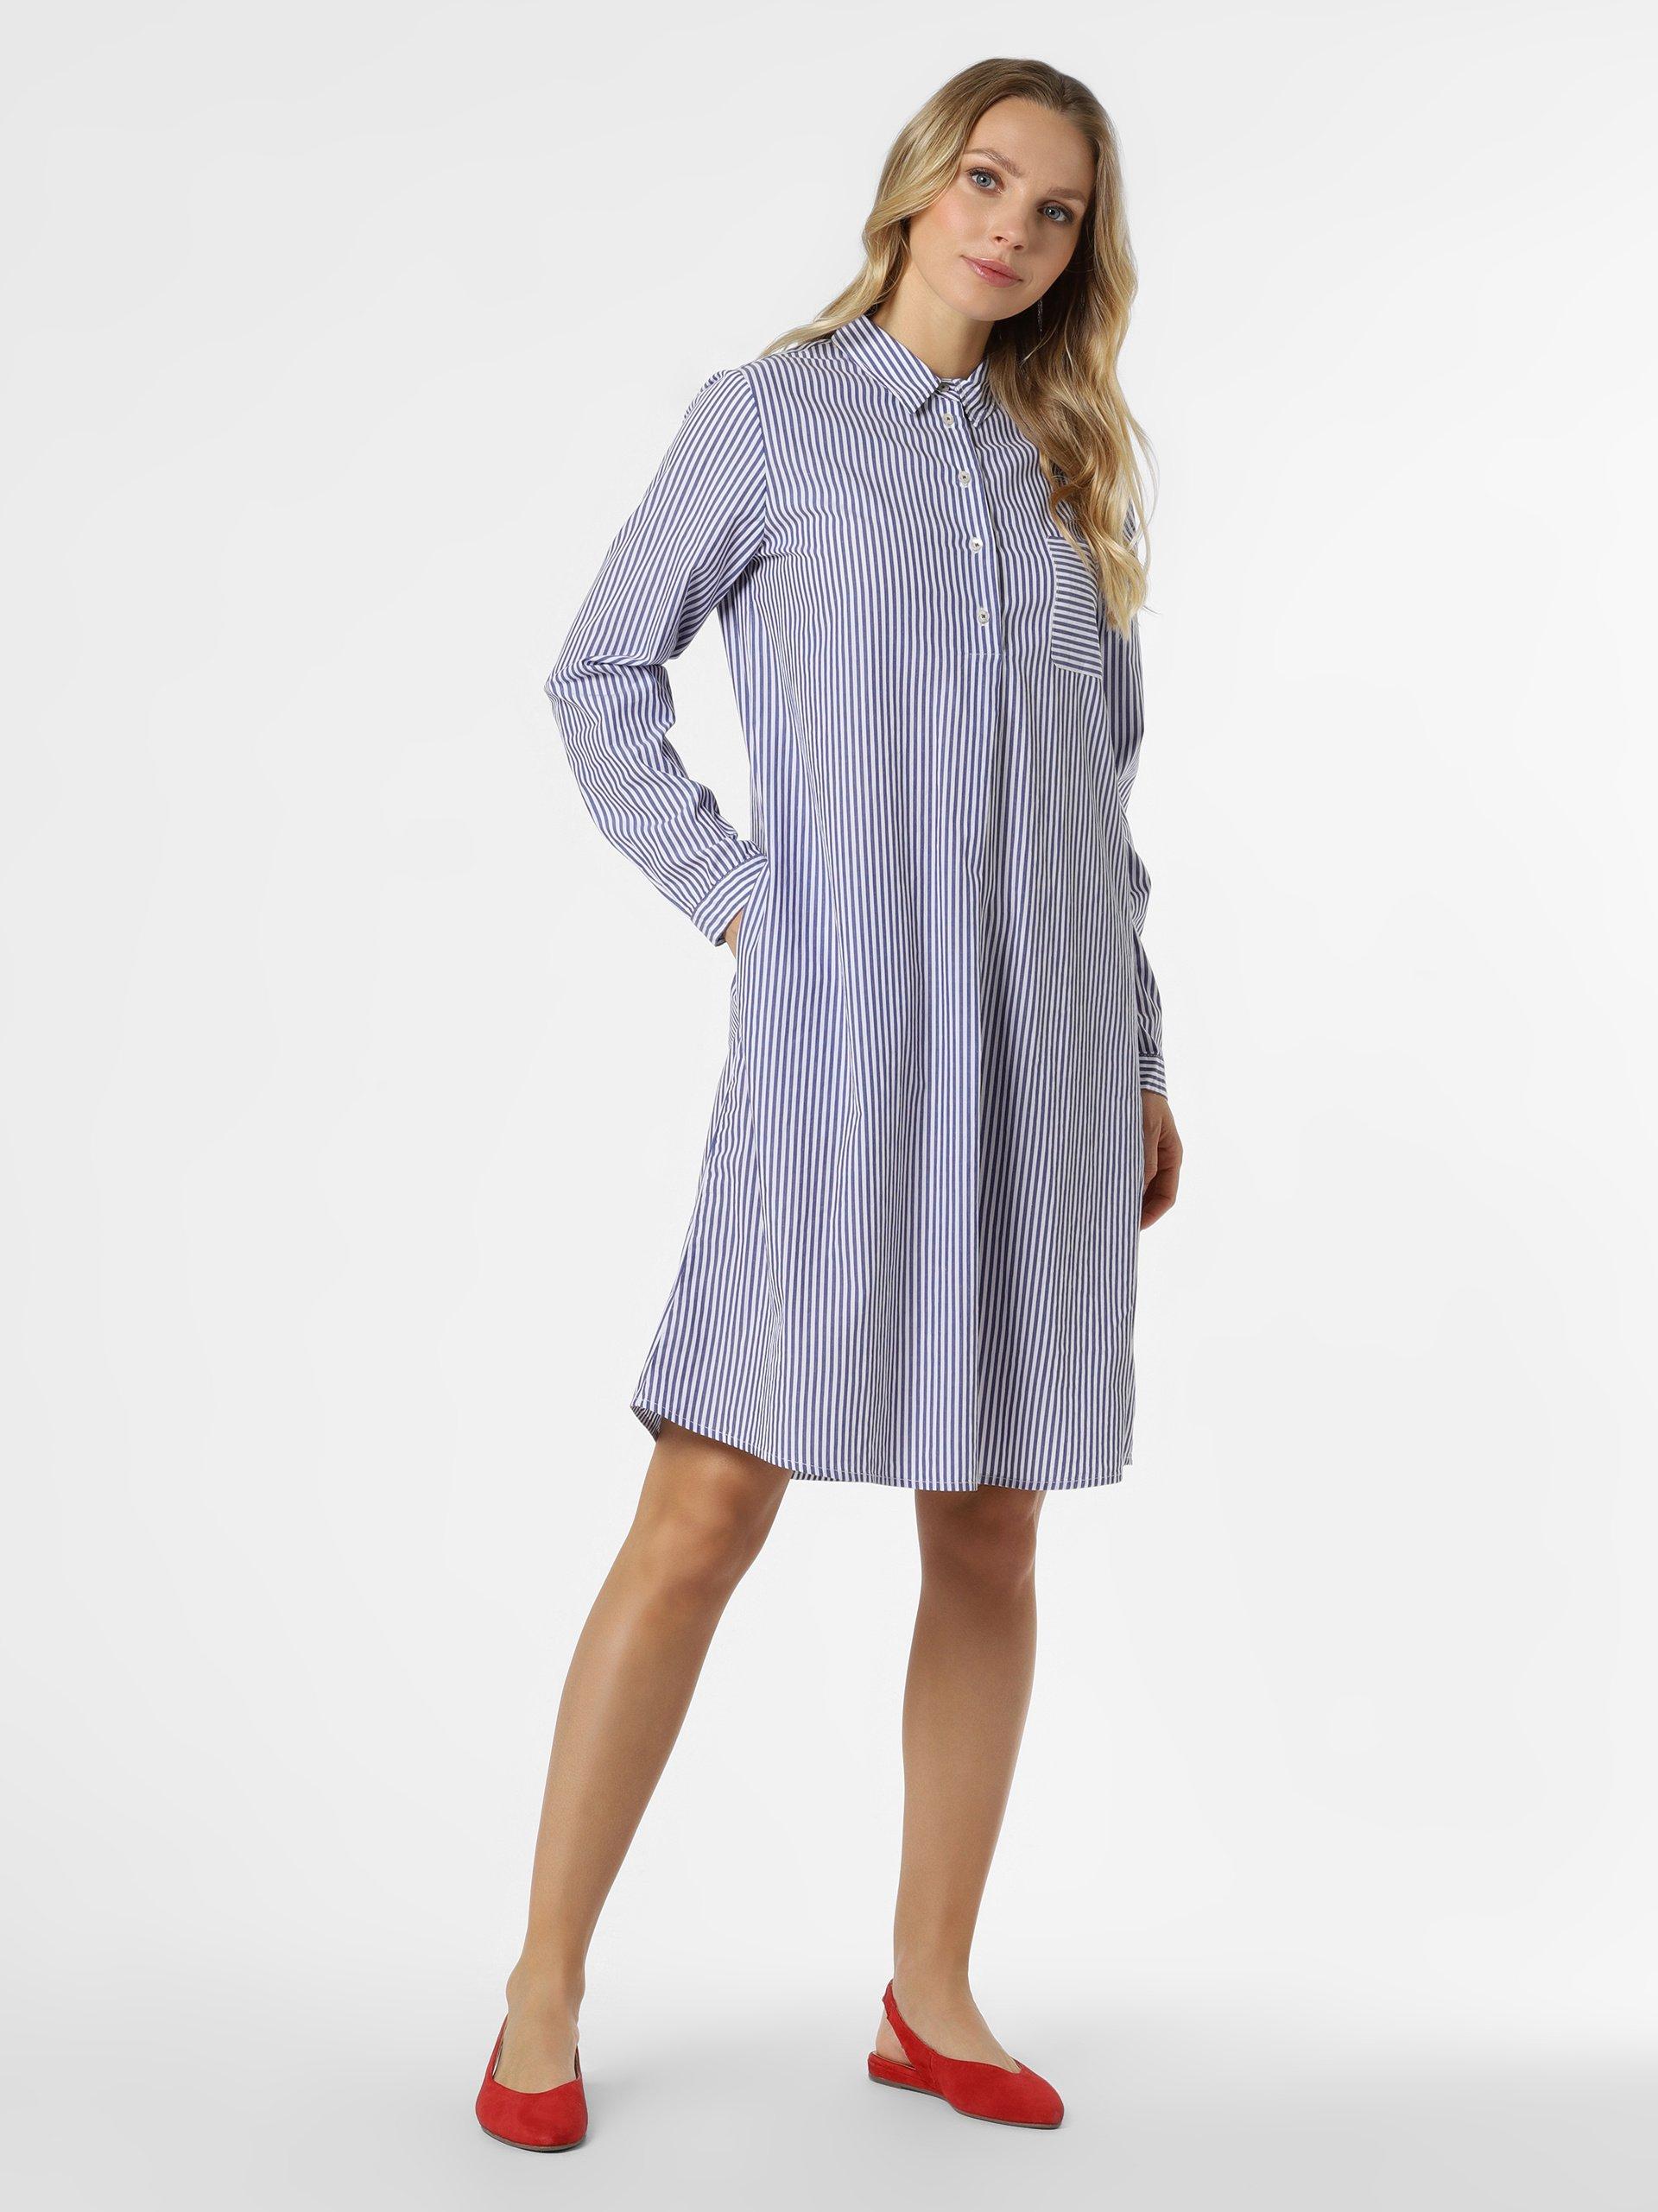 emily van den bergh damen kleid online kaufen  peekund